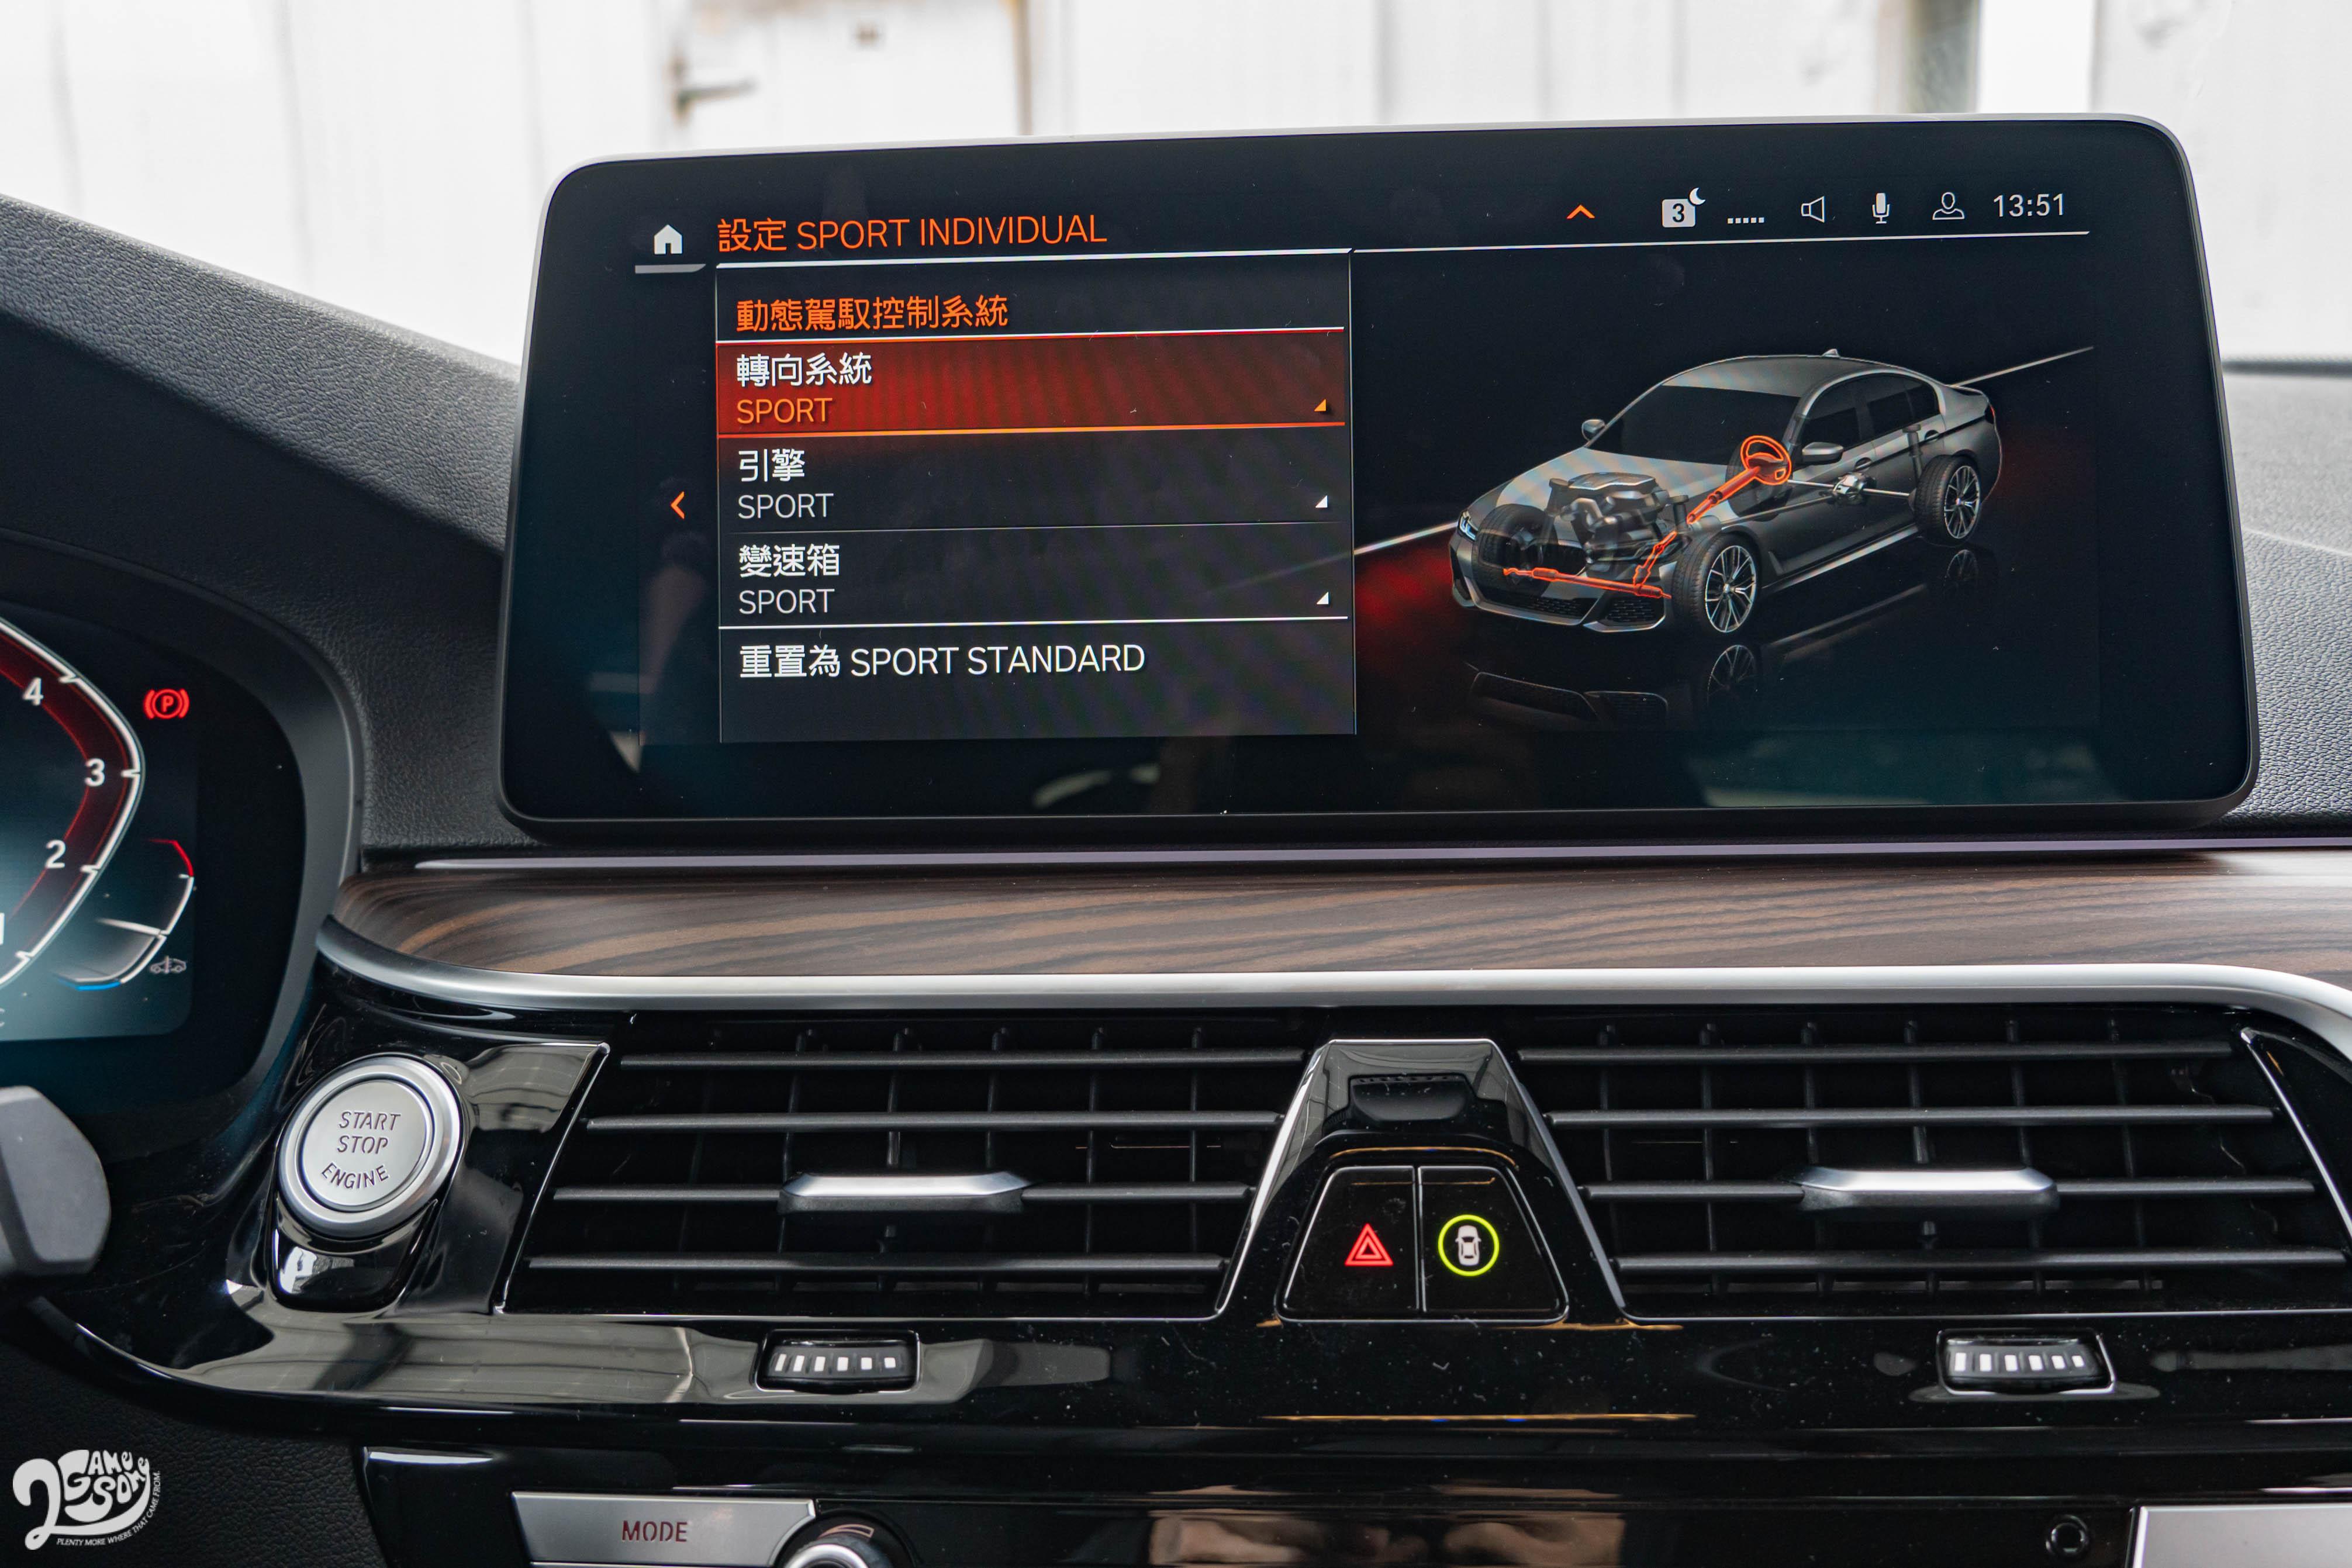 520i M Sport 提供 Eco Pro、Comfort、Sport 等模式,也可個別設置轉向、引擎、變速箱邏輯。